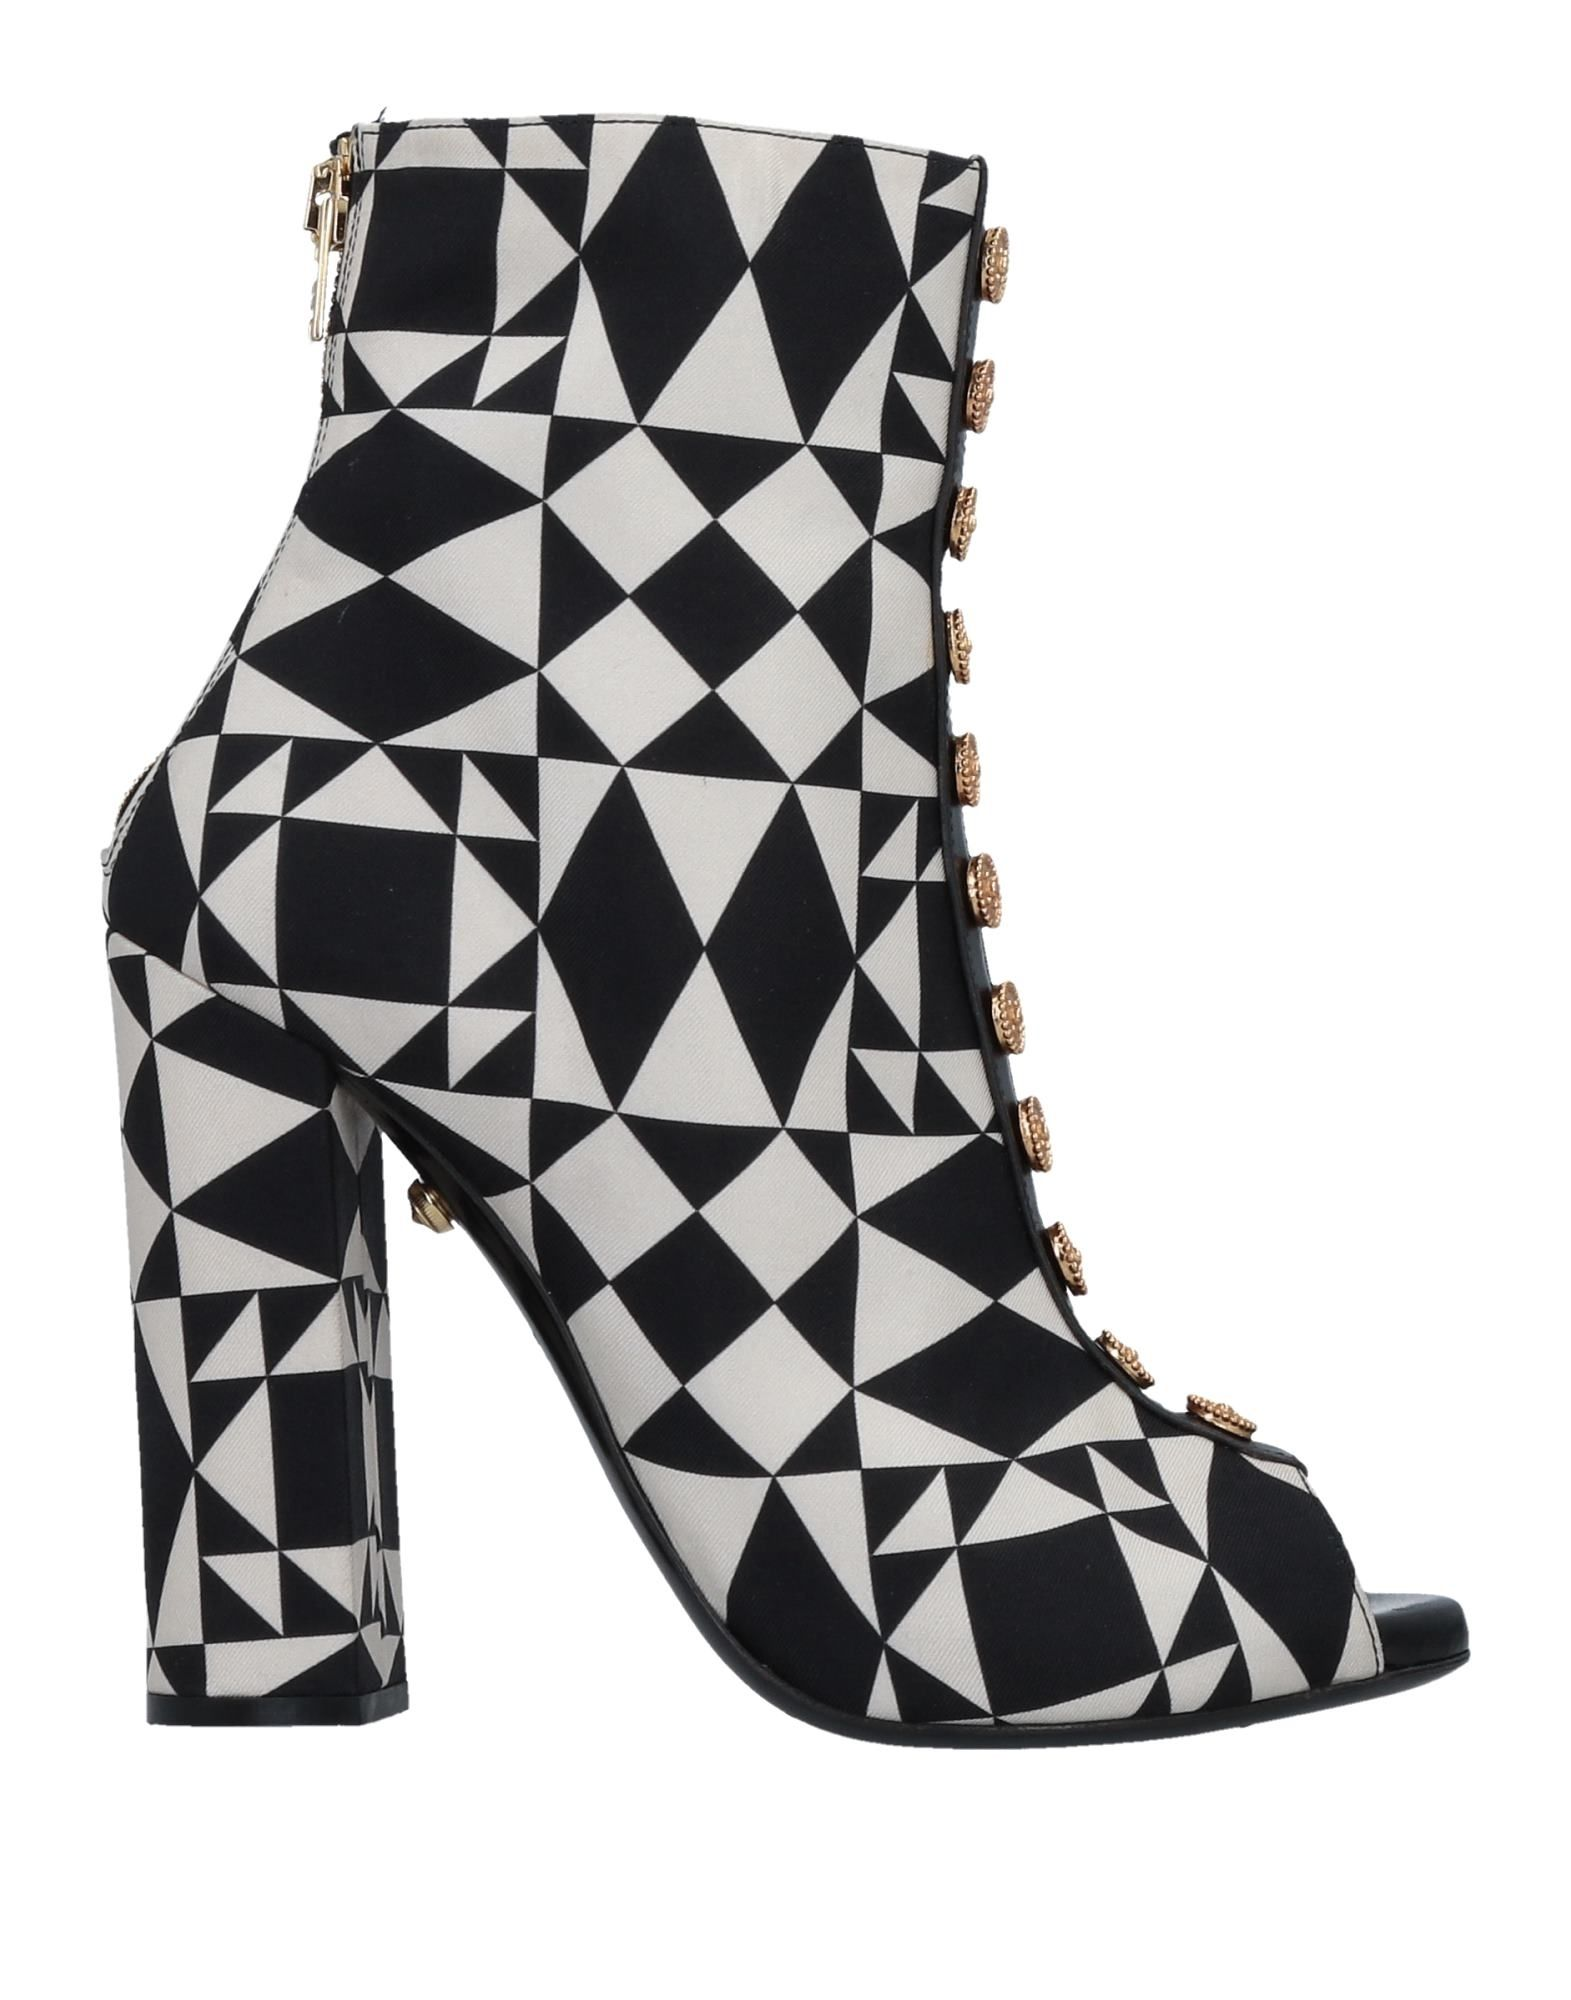 Fausto Puglisi Stiefelette aussehende Damen  11506764UBGünstige gut aussehende Stiefelette Schuhe 704691